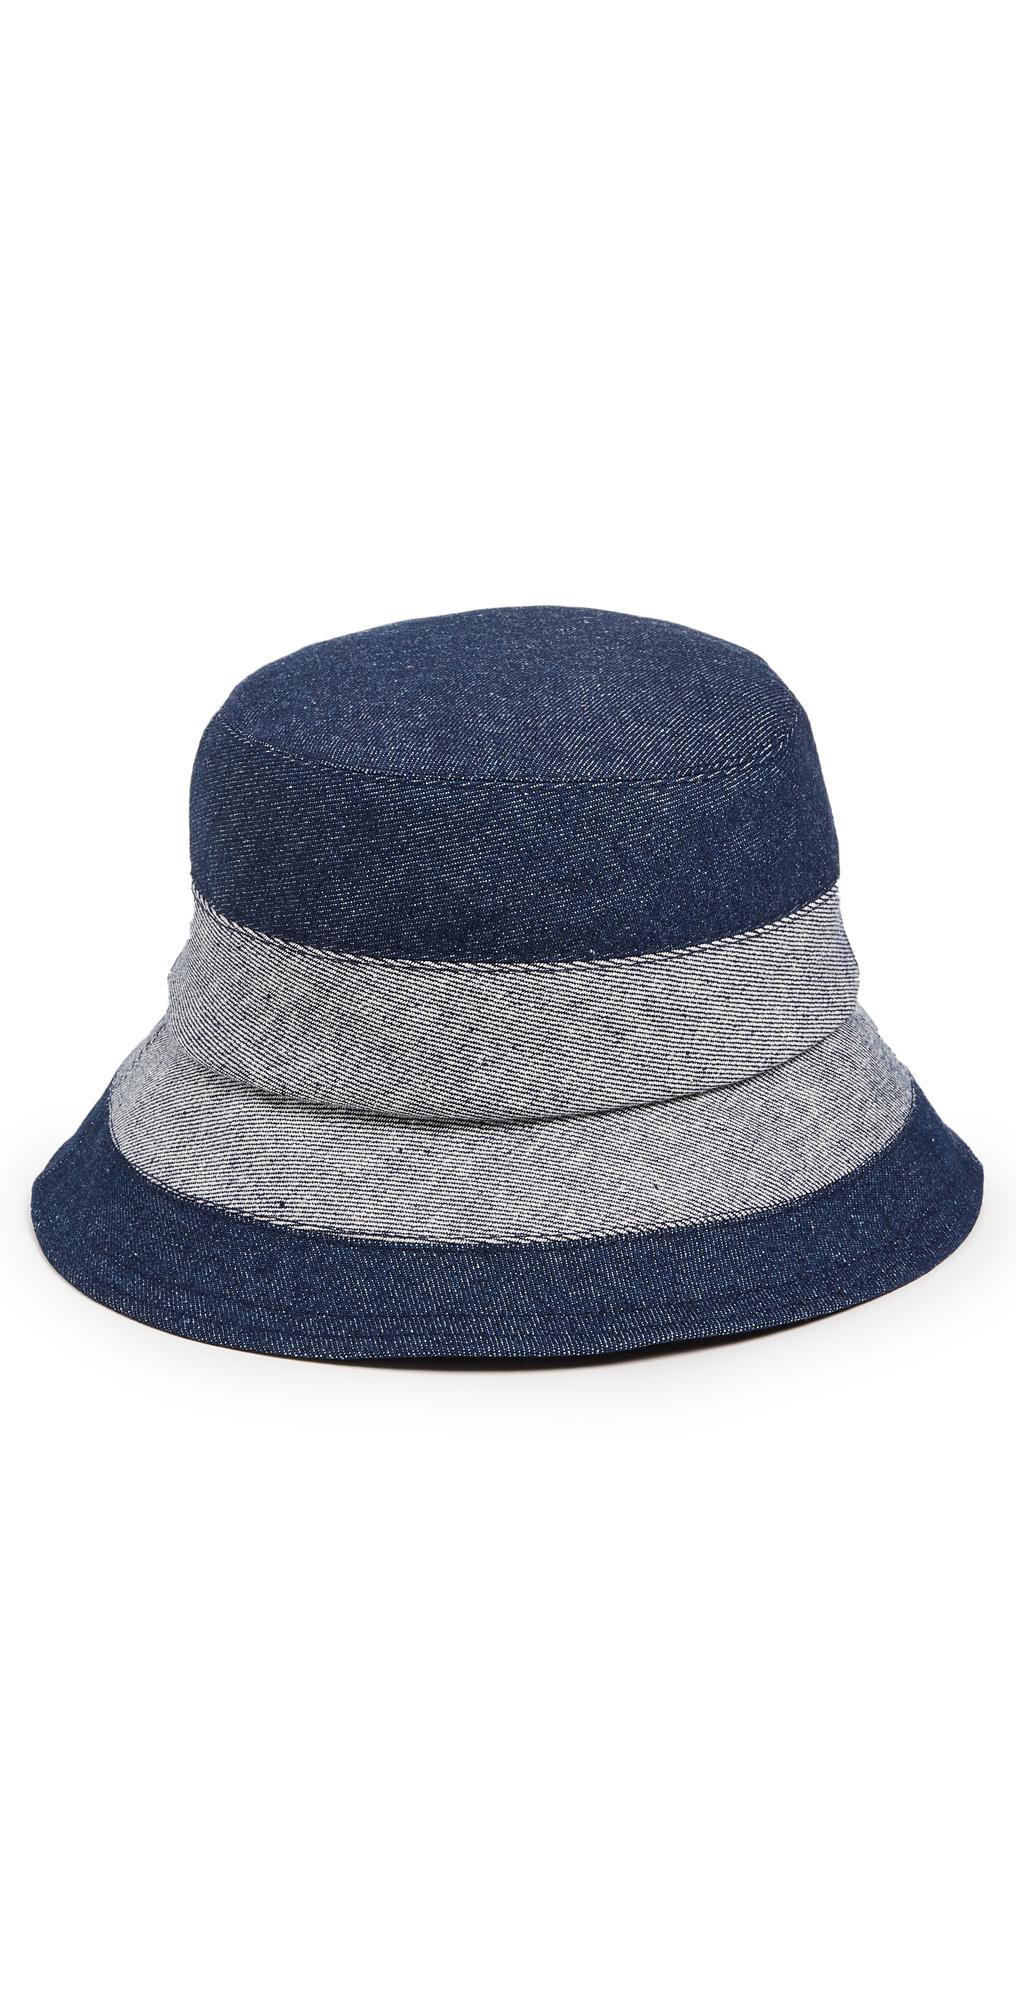 Denim Slided Bucket Hat